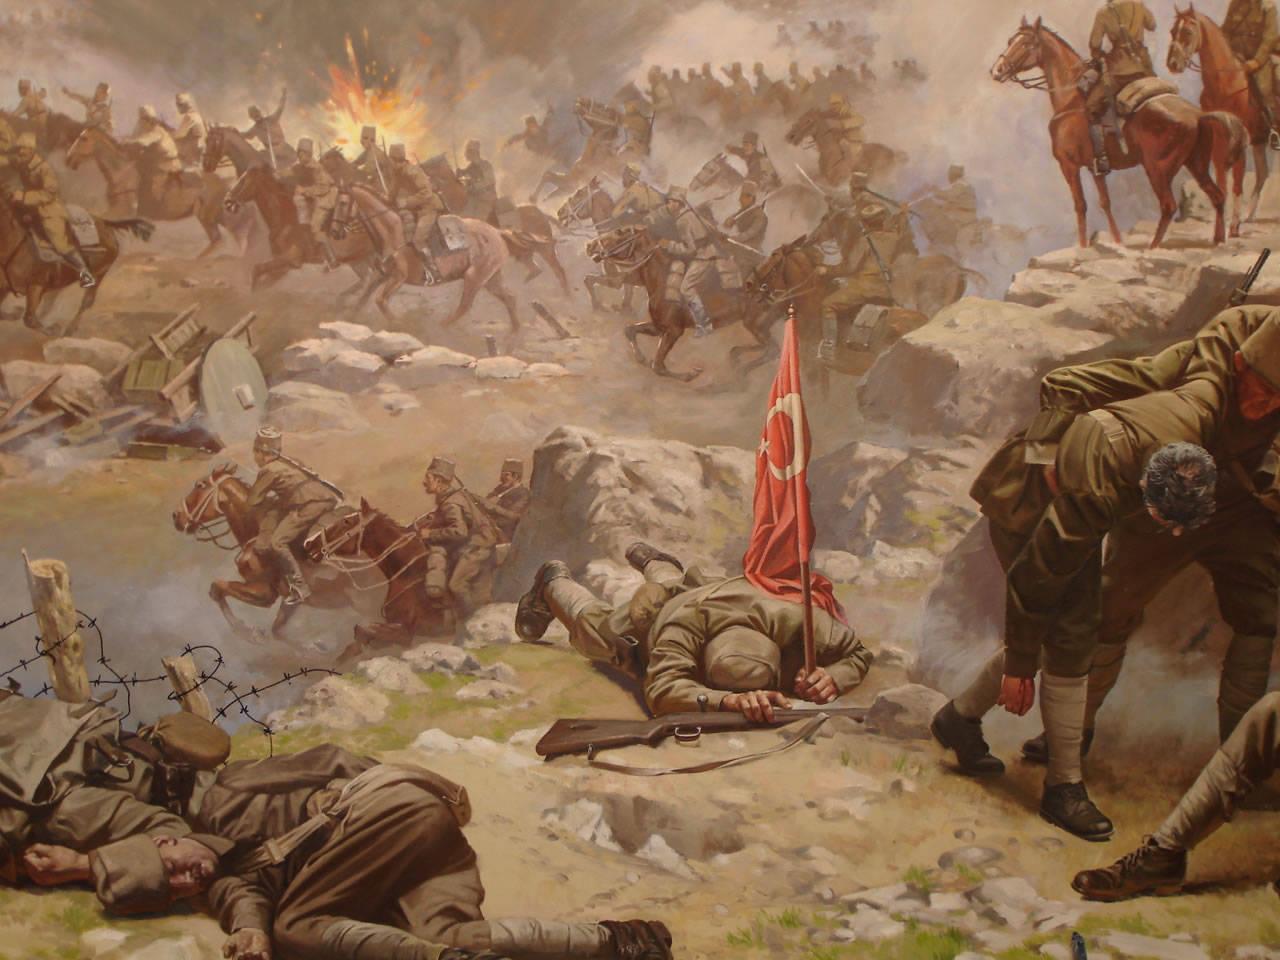 من ذكريات حرب الاستقلال 2854799d5bb506790d9a2dfbca1408dc317ff1e